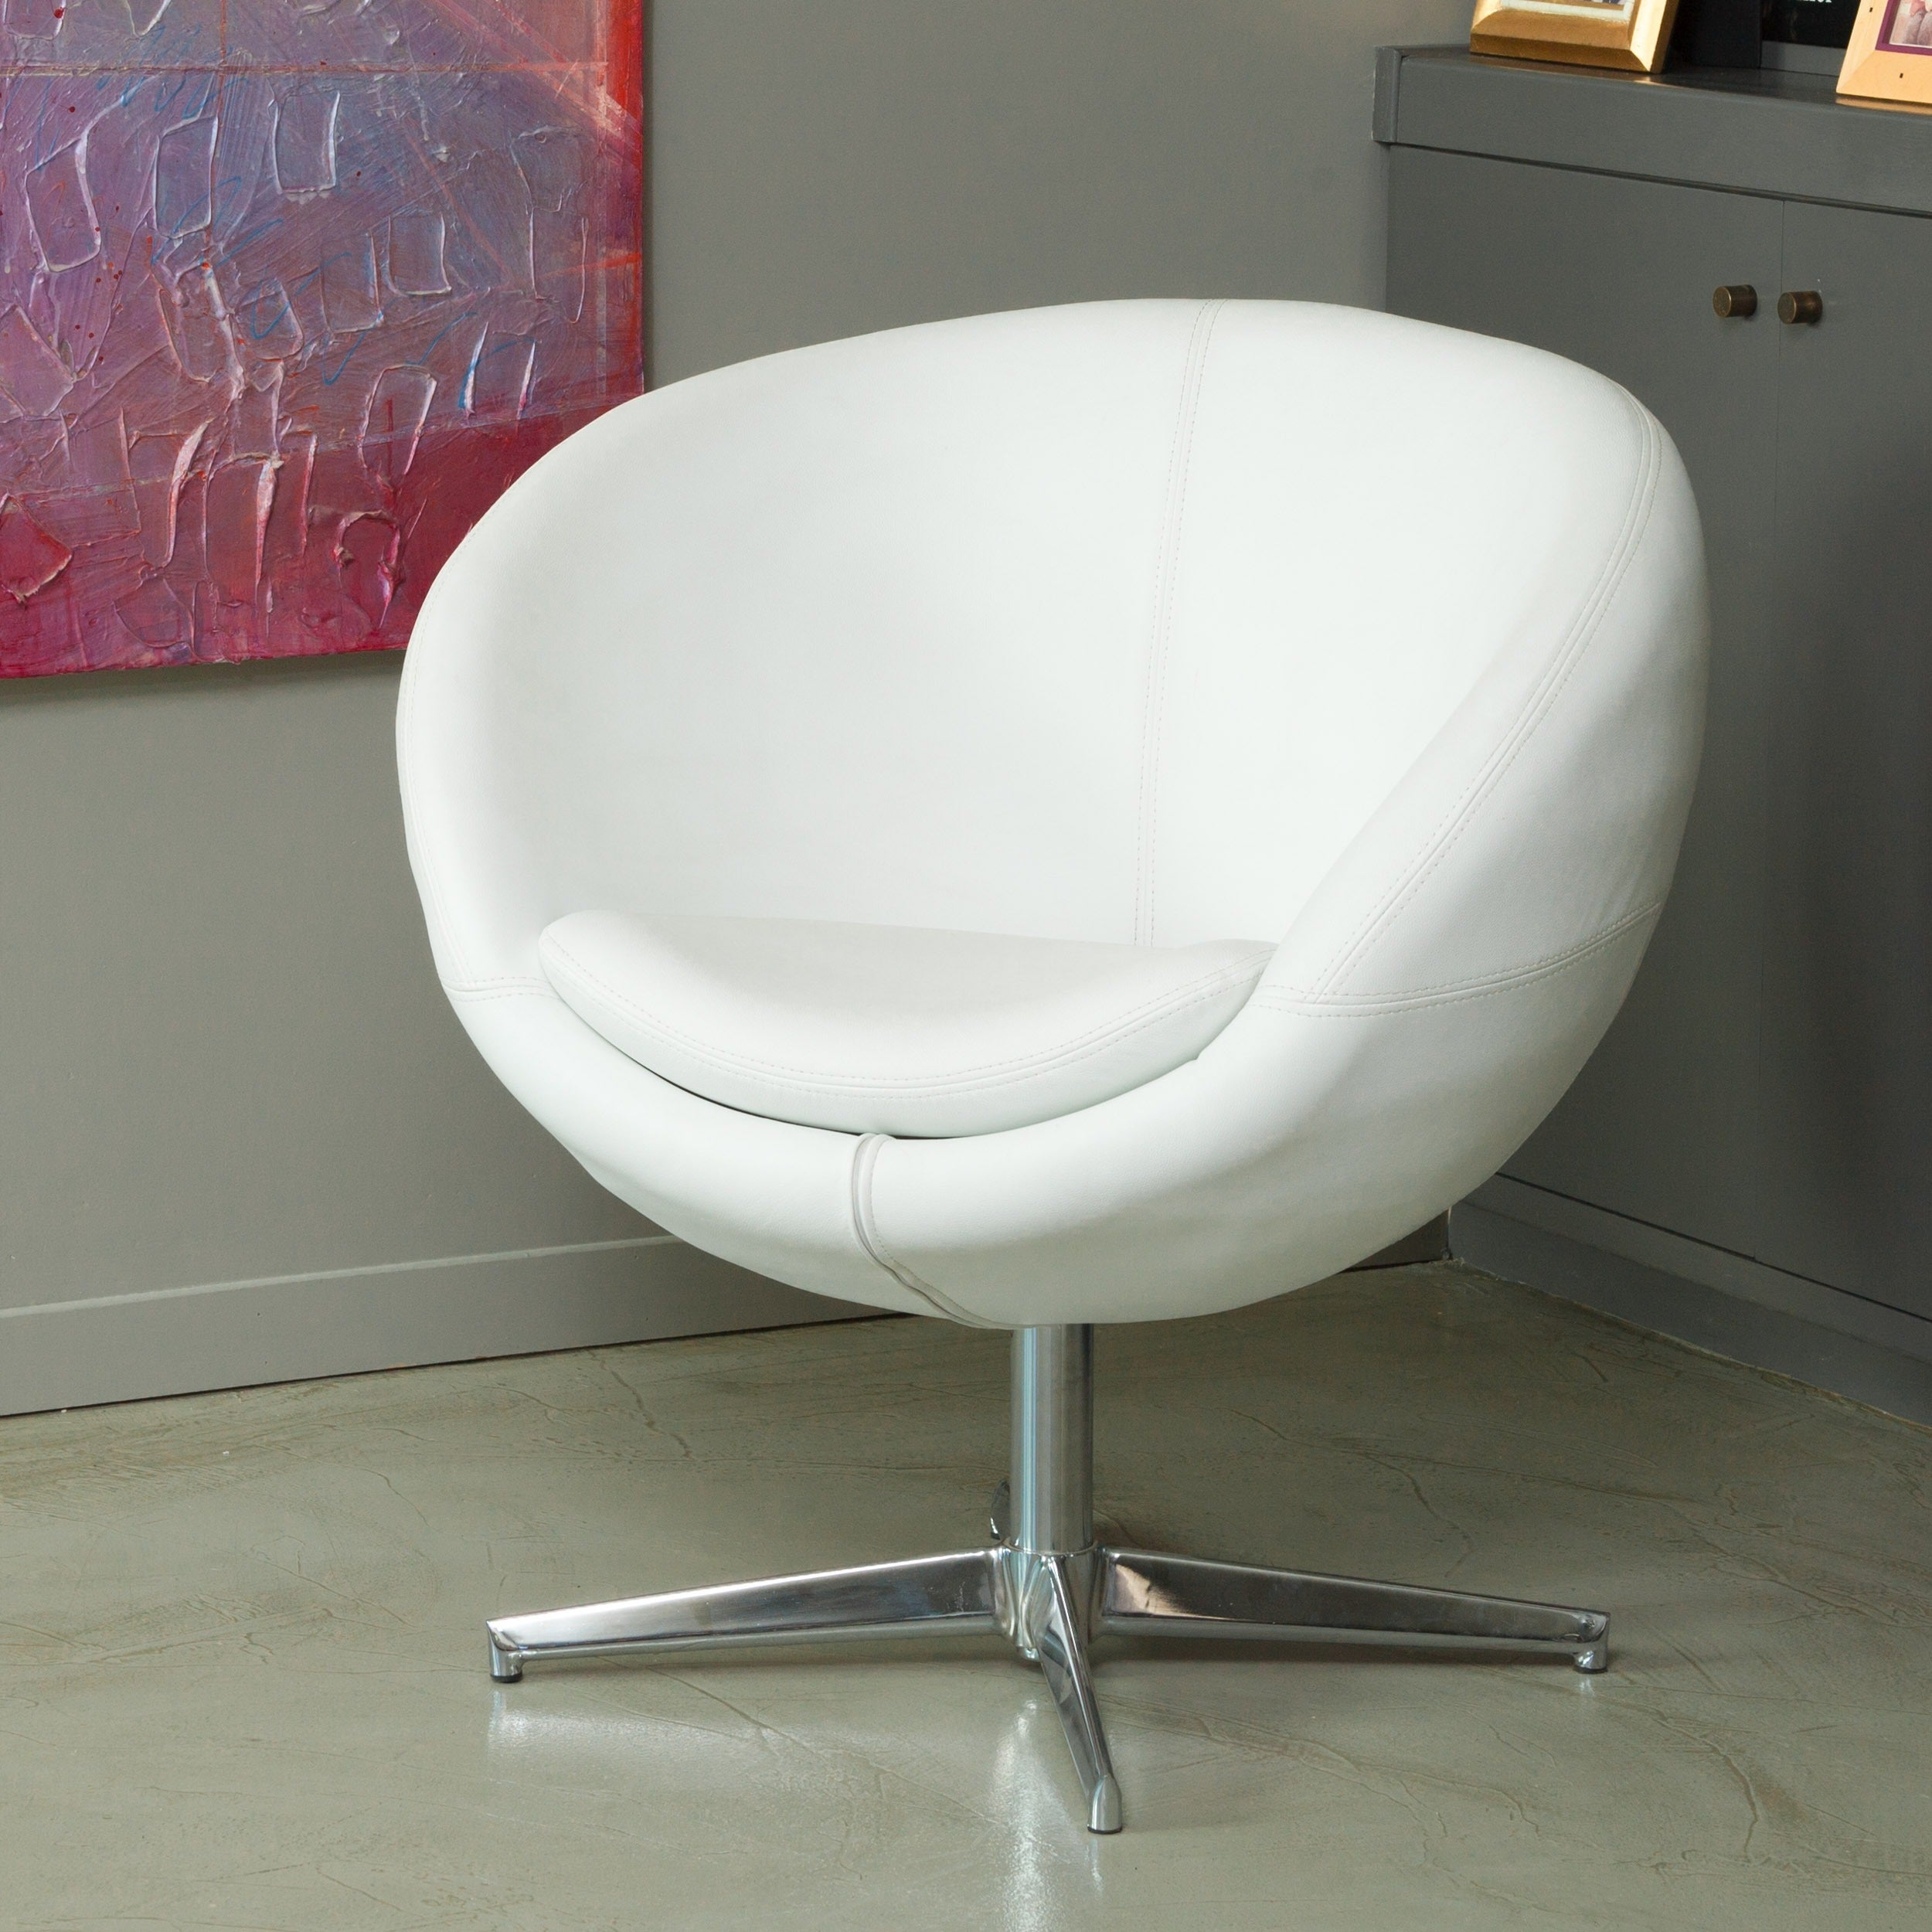 Peachy Christopher Knight Home Modern White Bonded Leather Roundback Chair Uwap Interior Chair Design Uwaporg